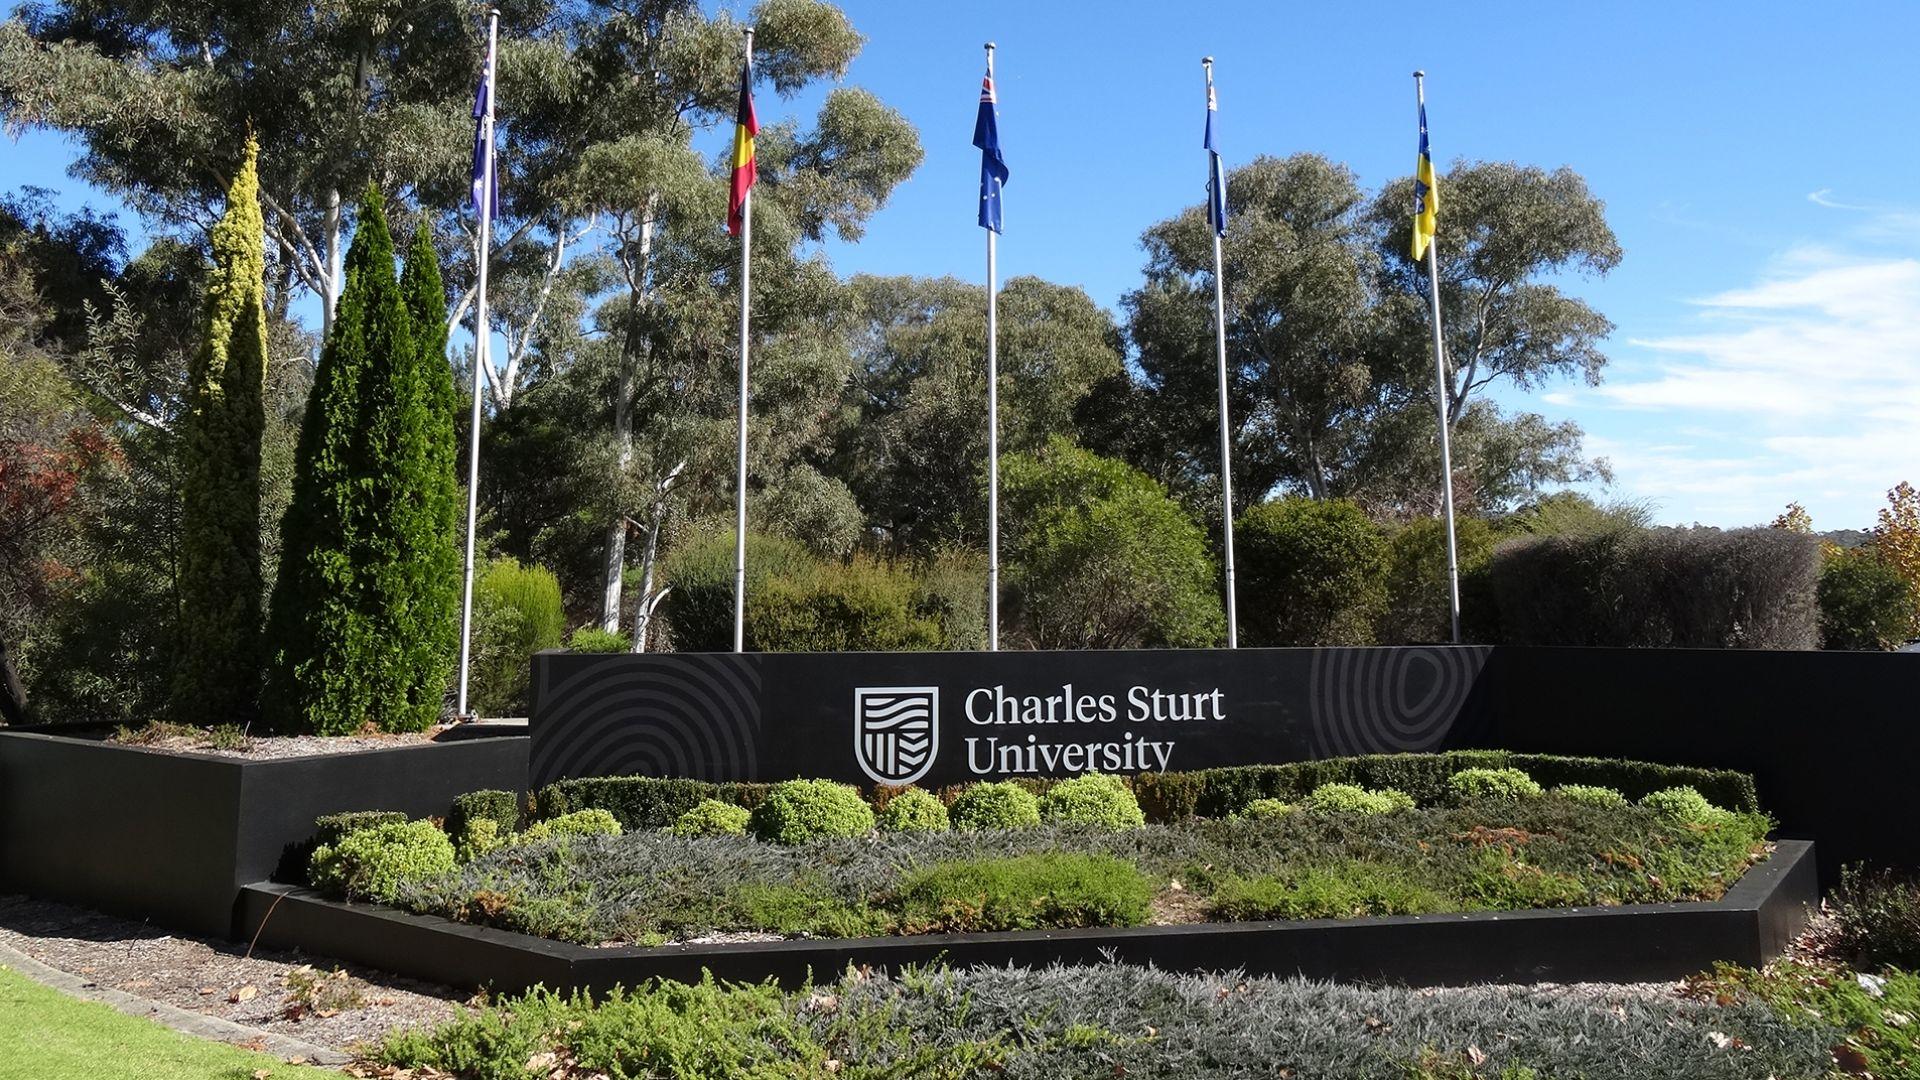 Charles Sturt University supports 2019 National Simultaneous Storytime